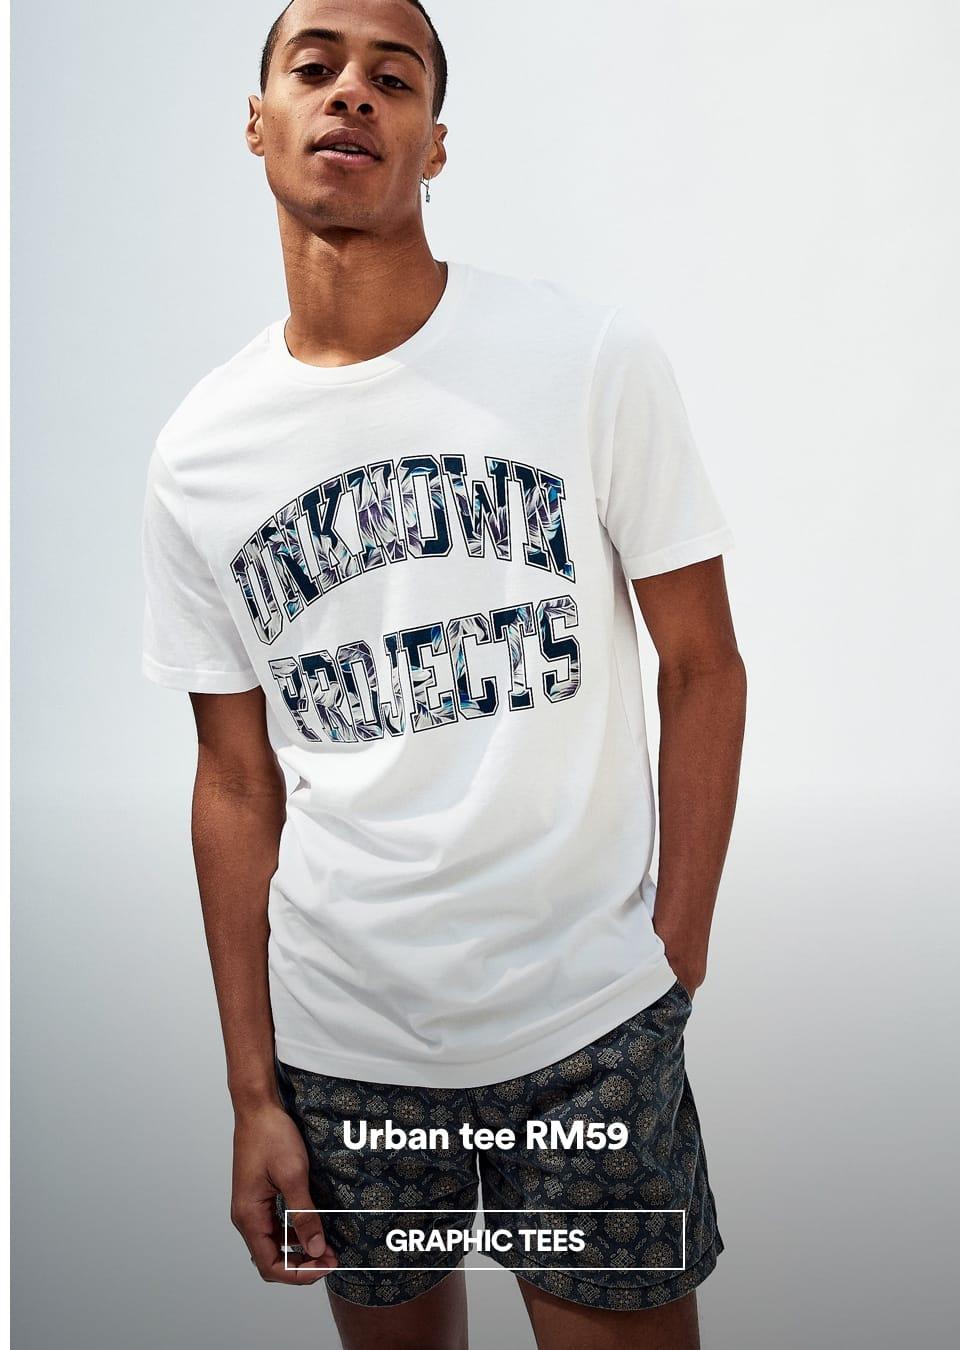 Men's Urban Tee. Click to shop